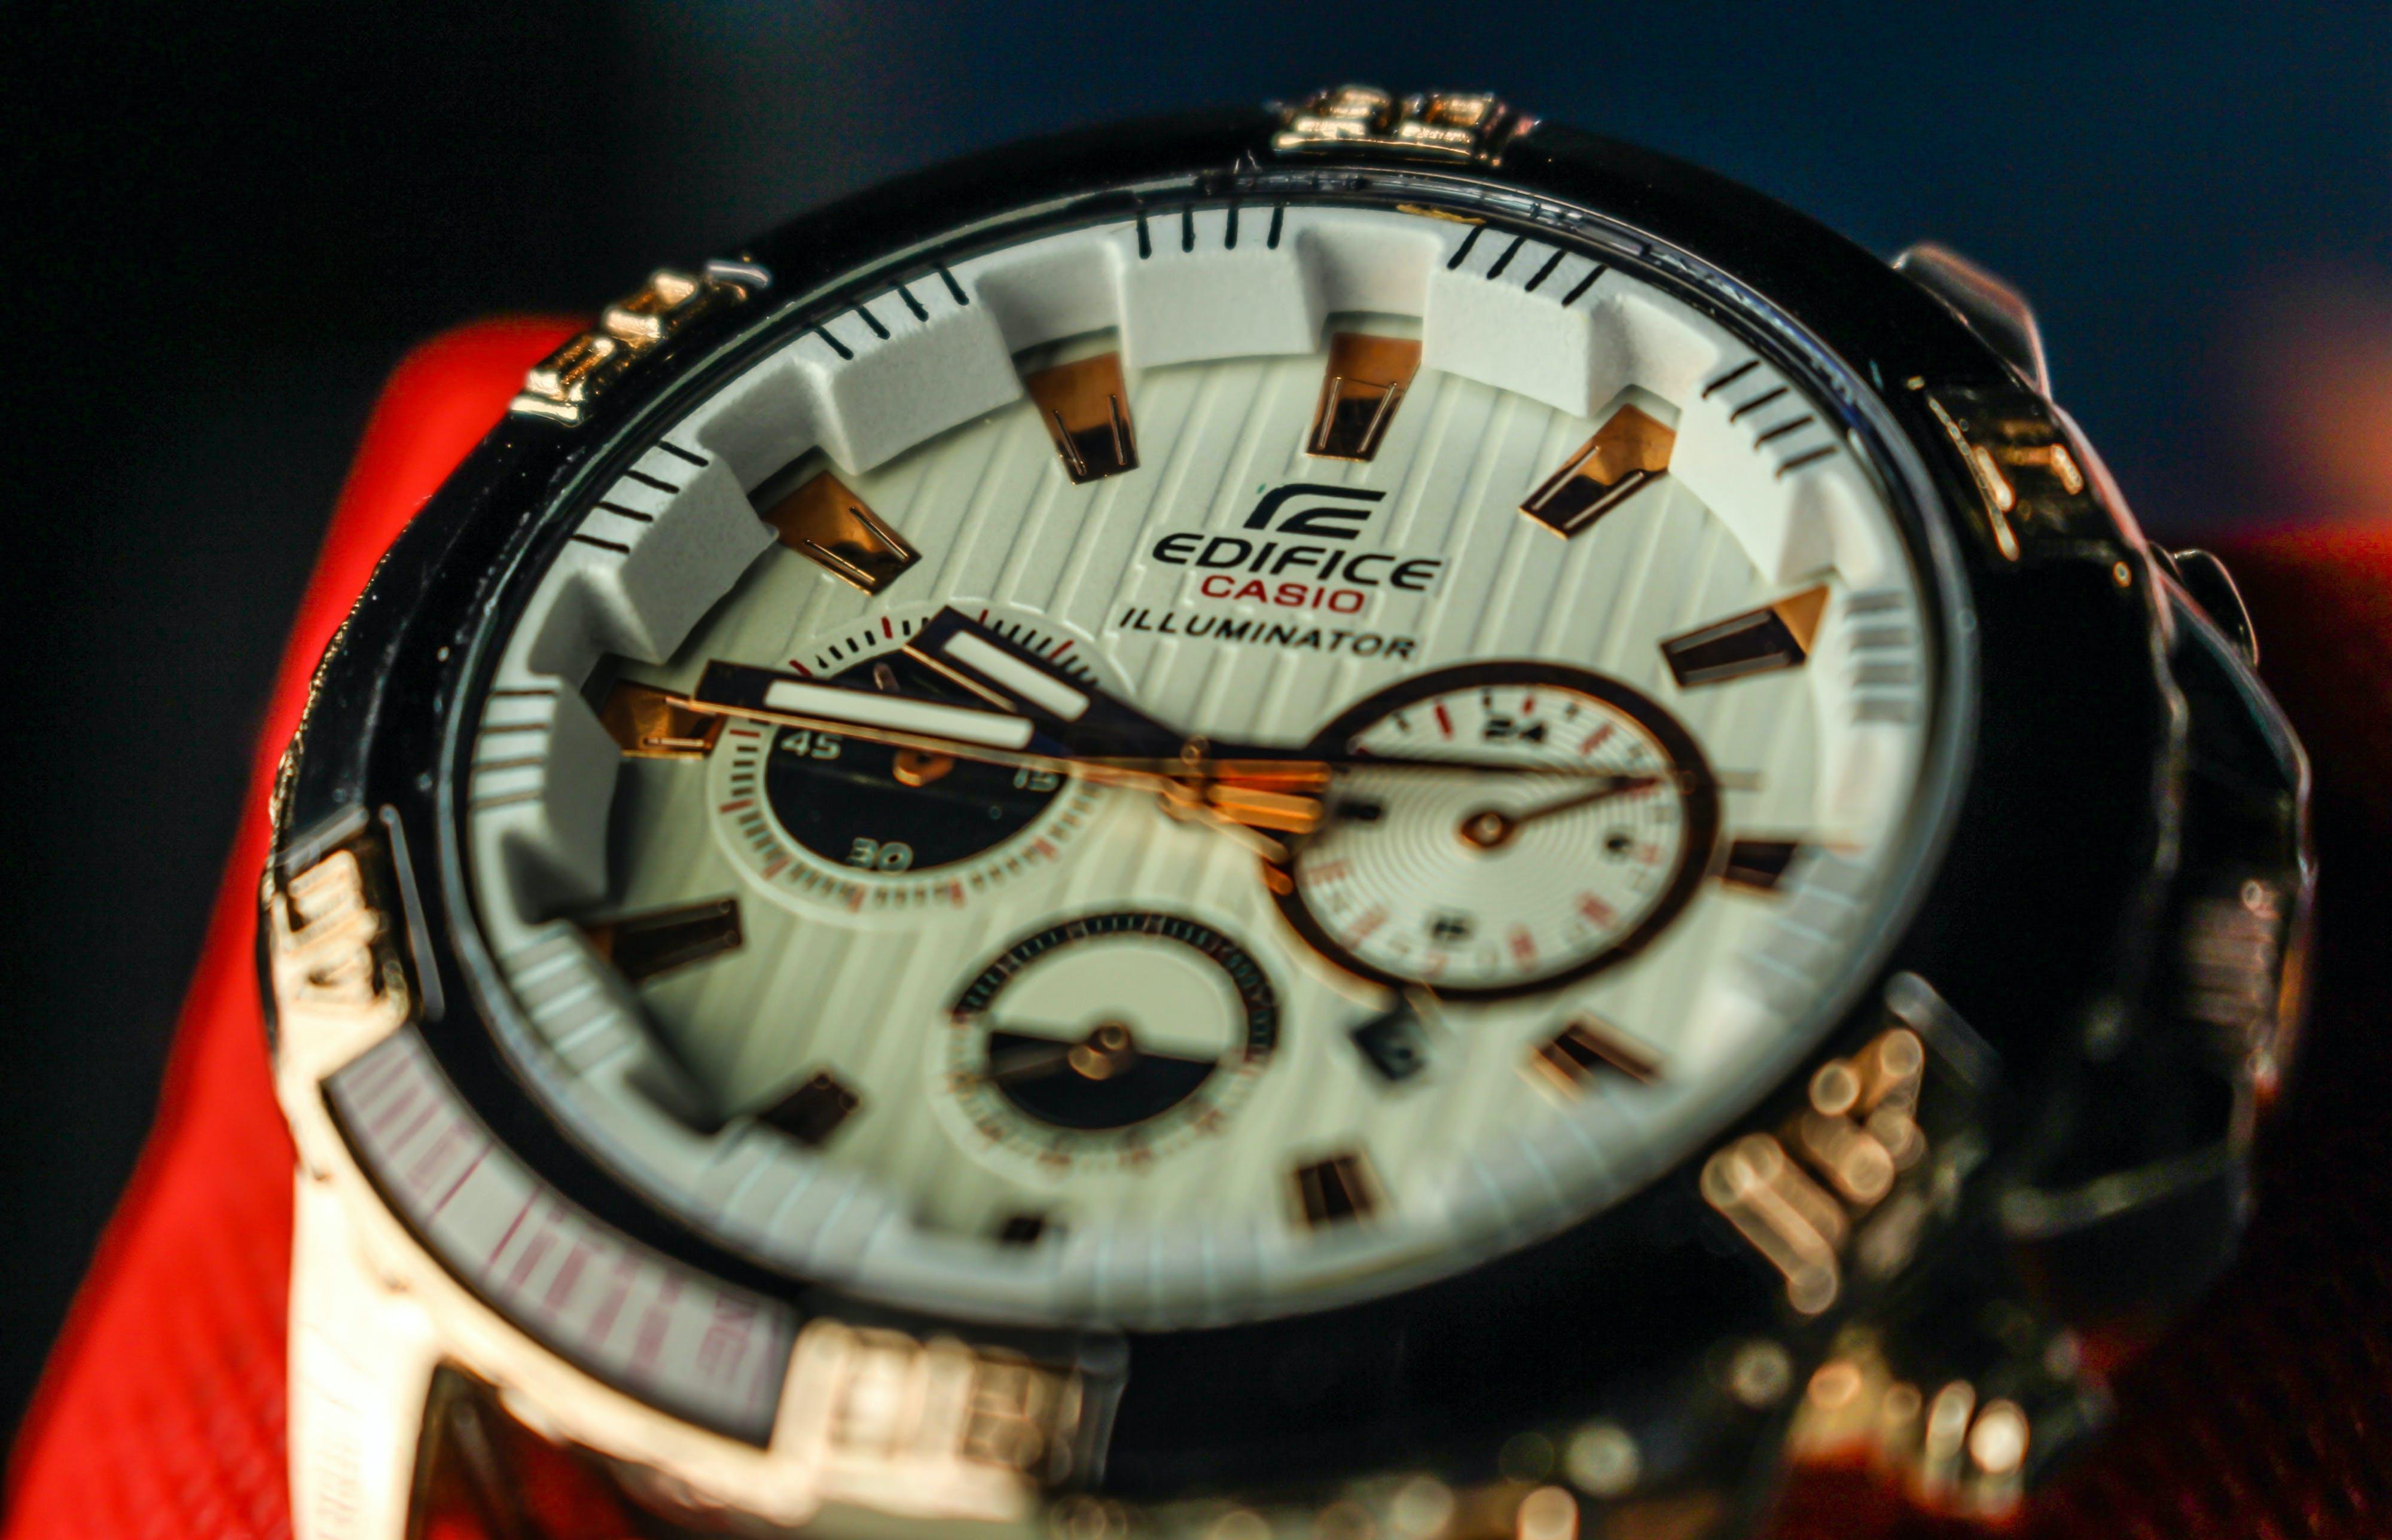 Round White and Silver-colored Casio Edifice Chronograph Watch